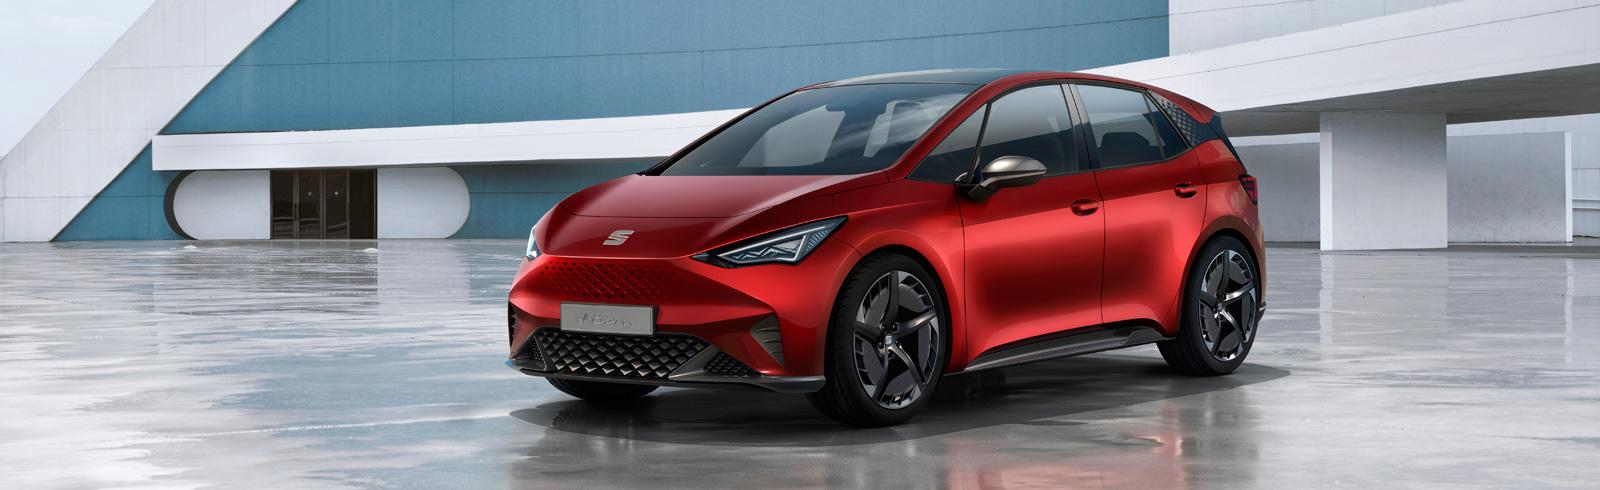 Seat el-Born concept goes official